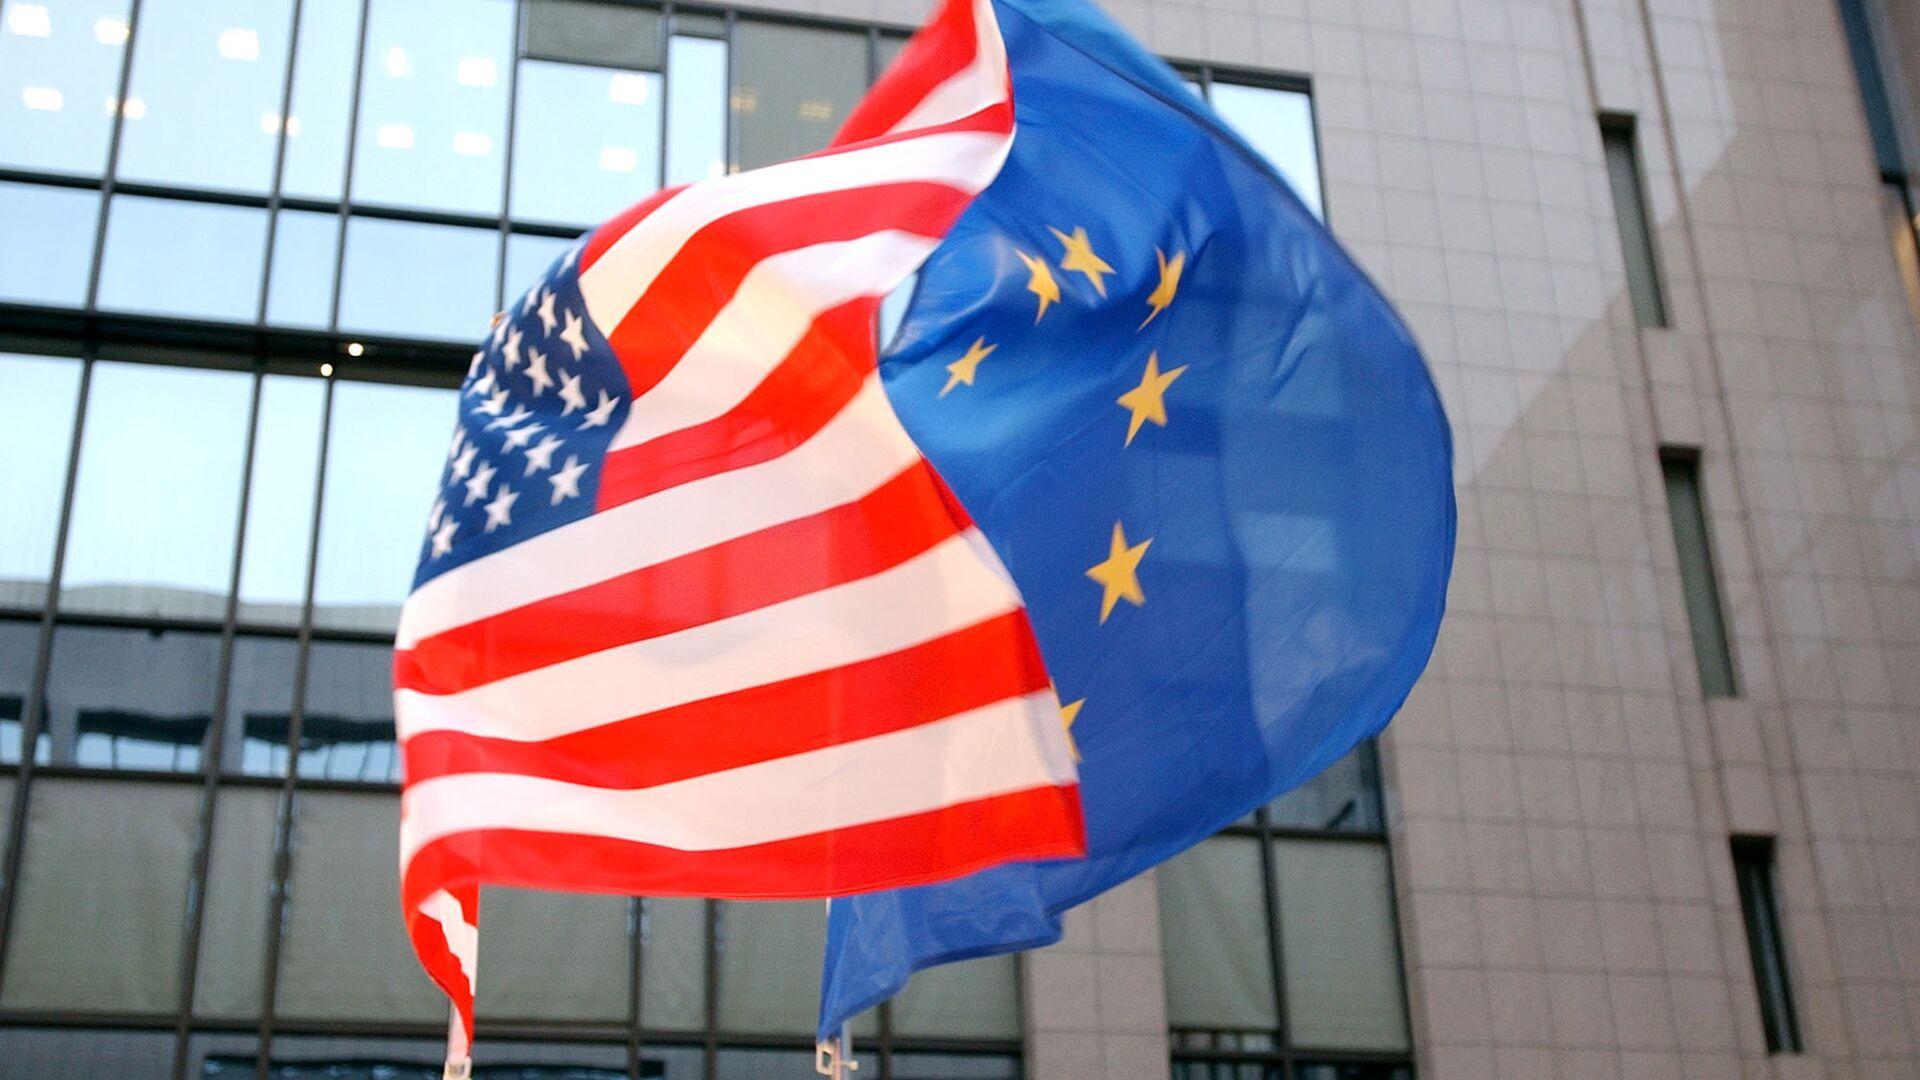 Флаги ЕС и США на здании Европейского парламента в Брюсселе  - РИА Новости, 1920, 10.09.2020